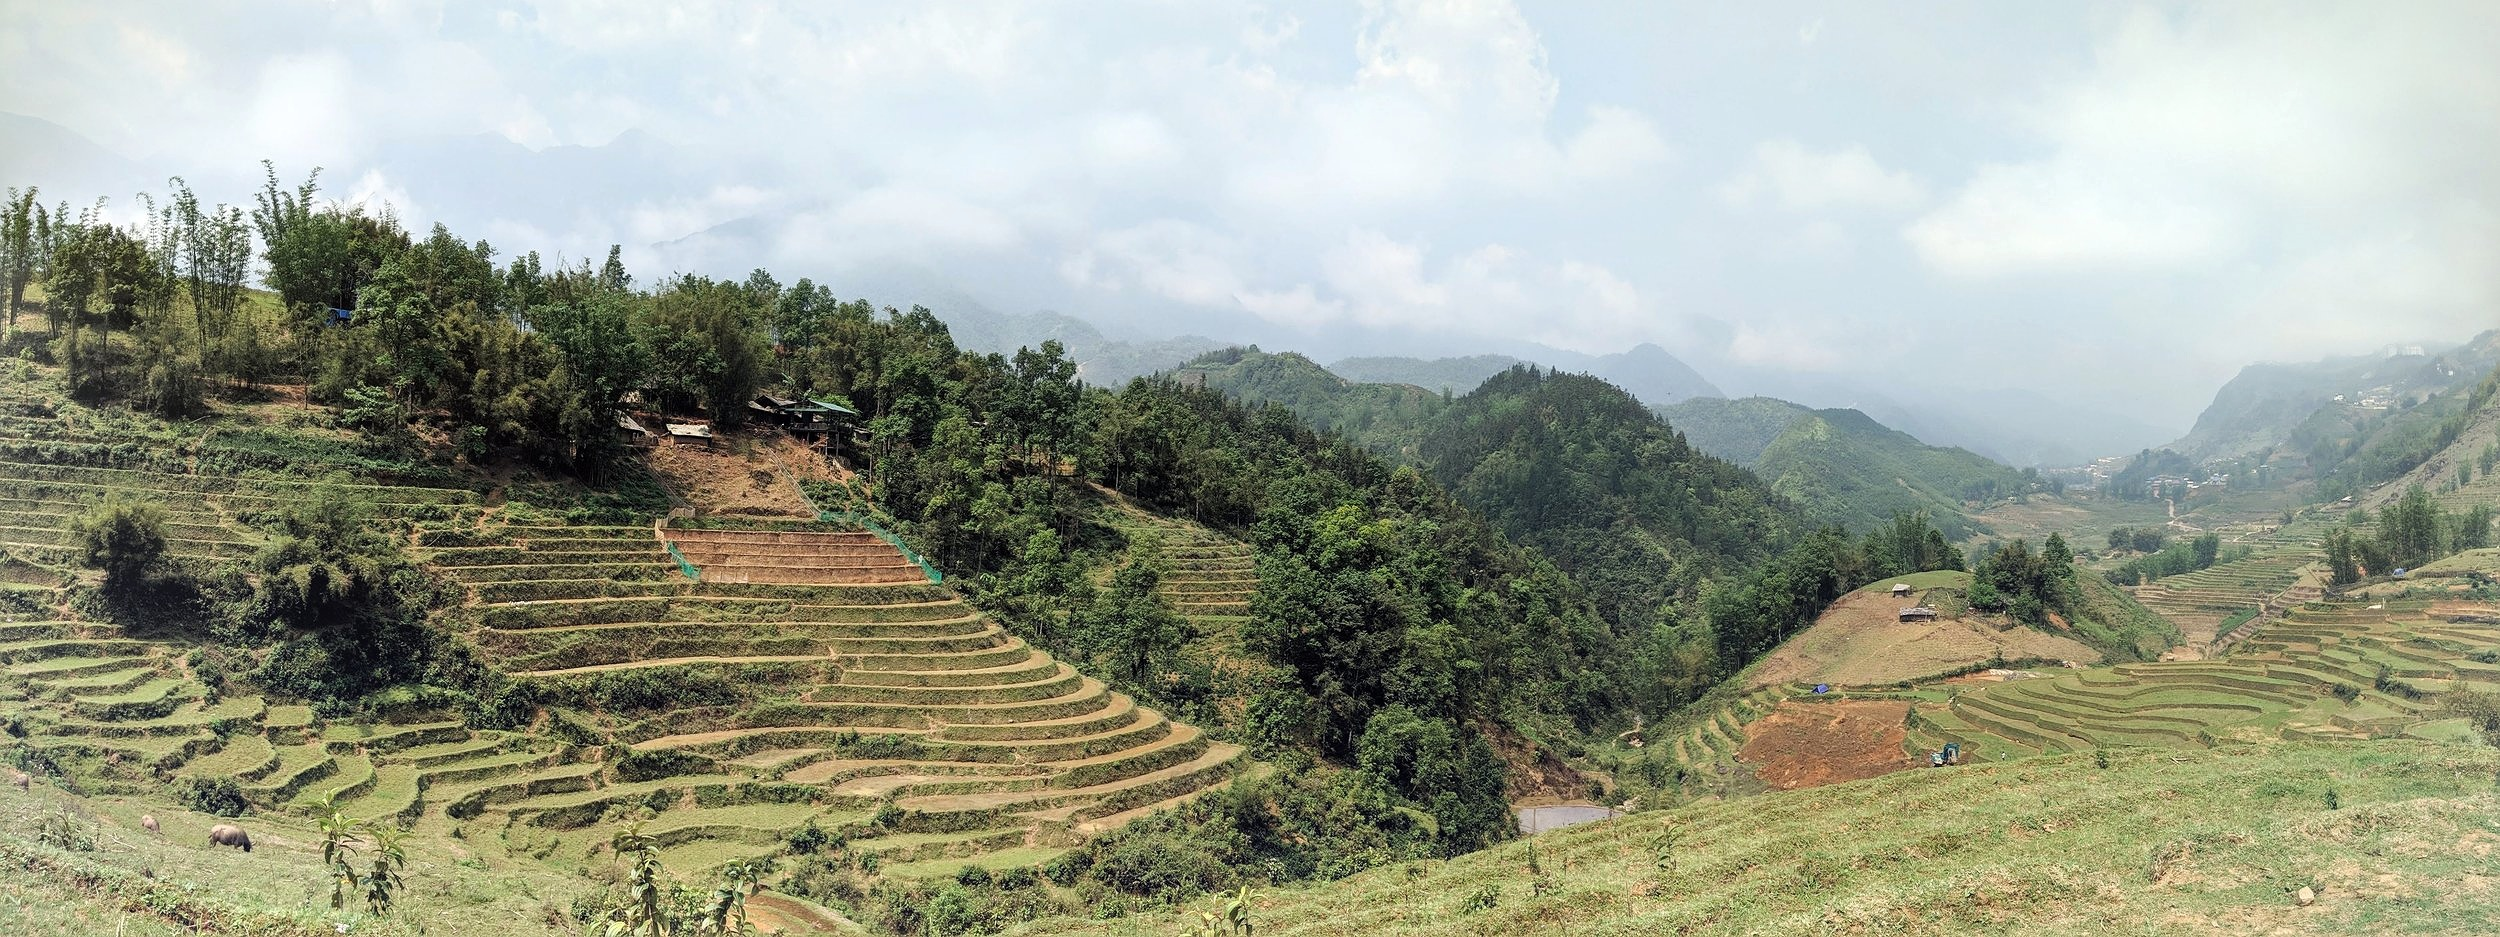 The Amazing Sapa, Vietnam